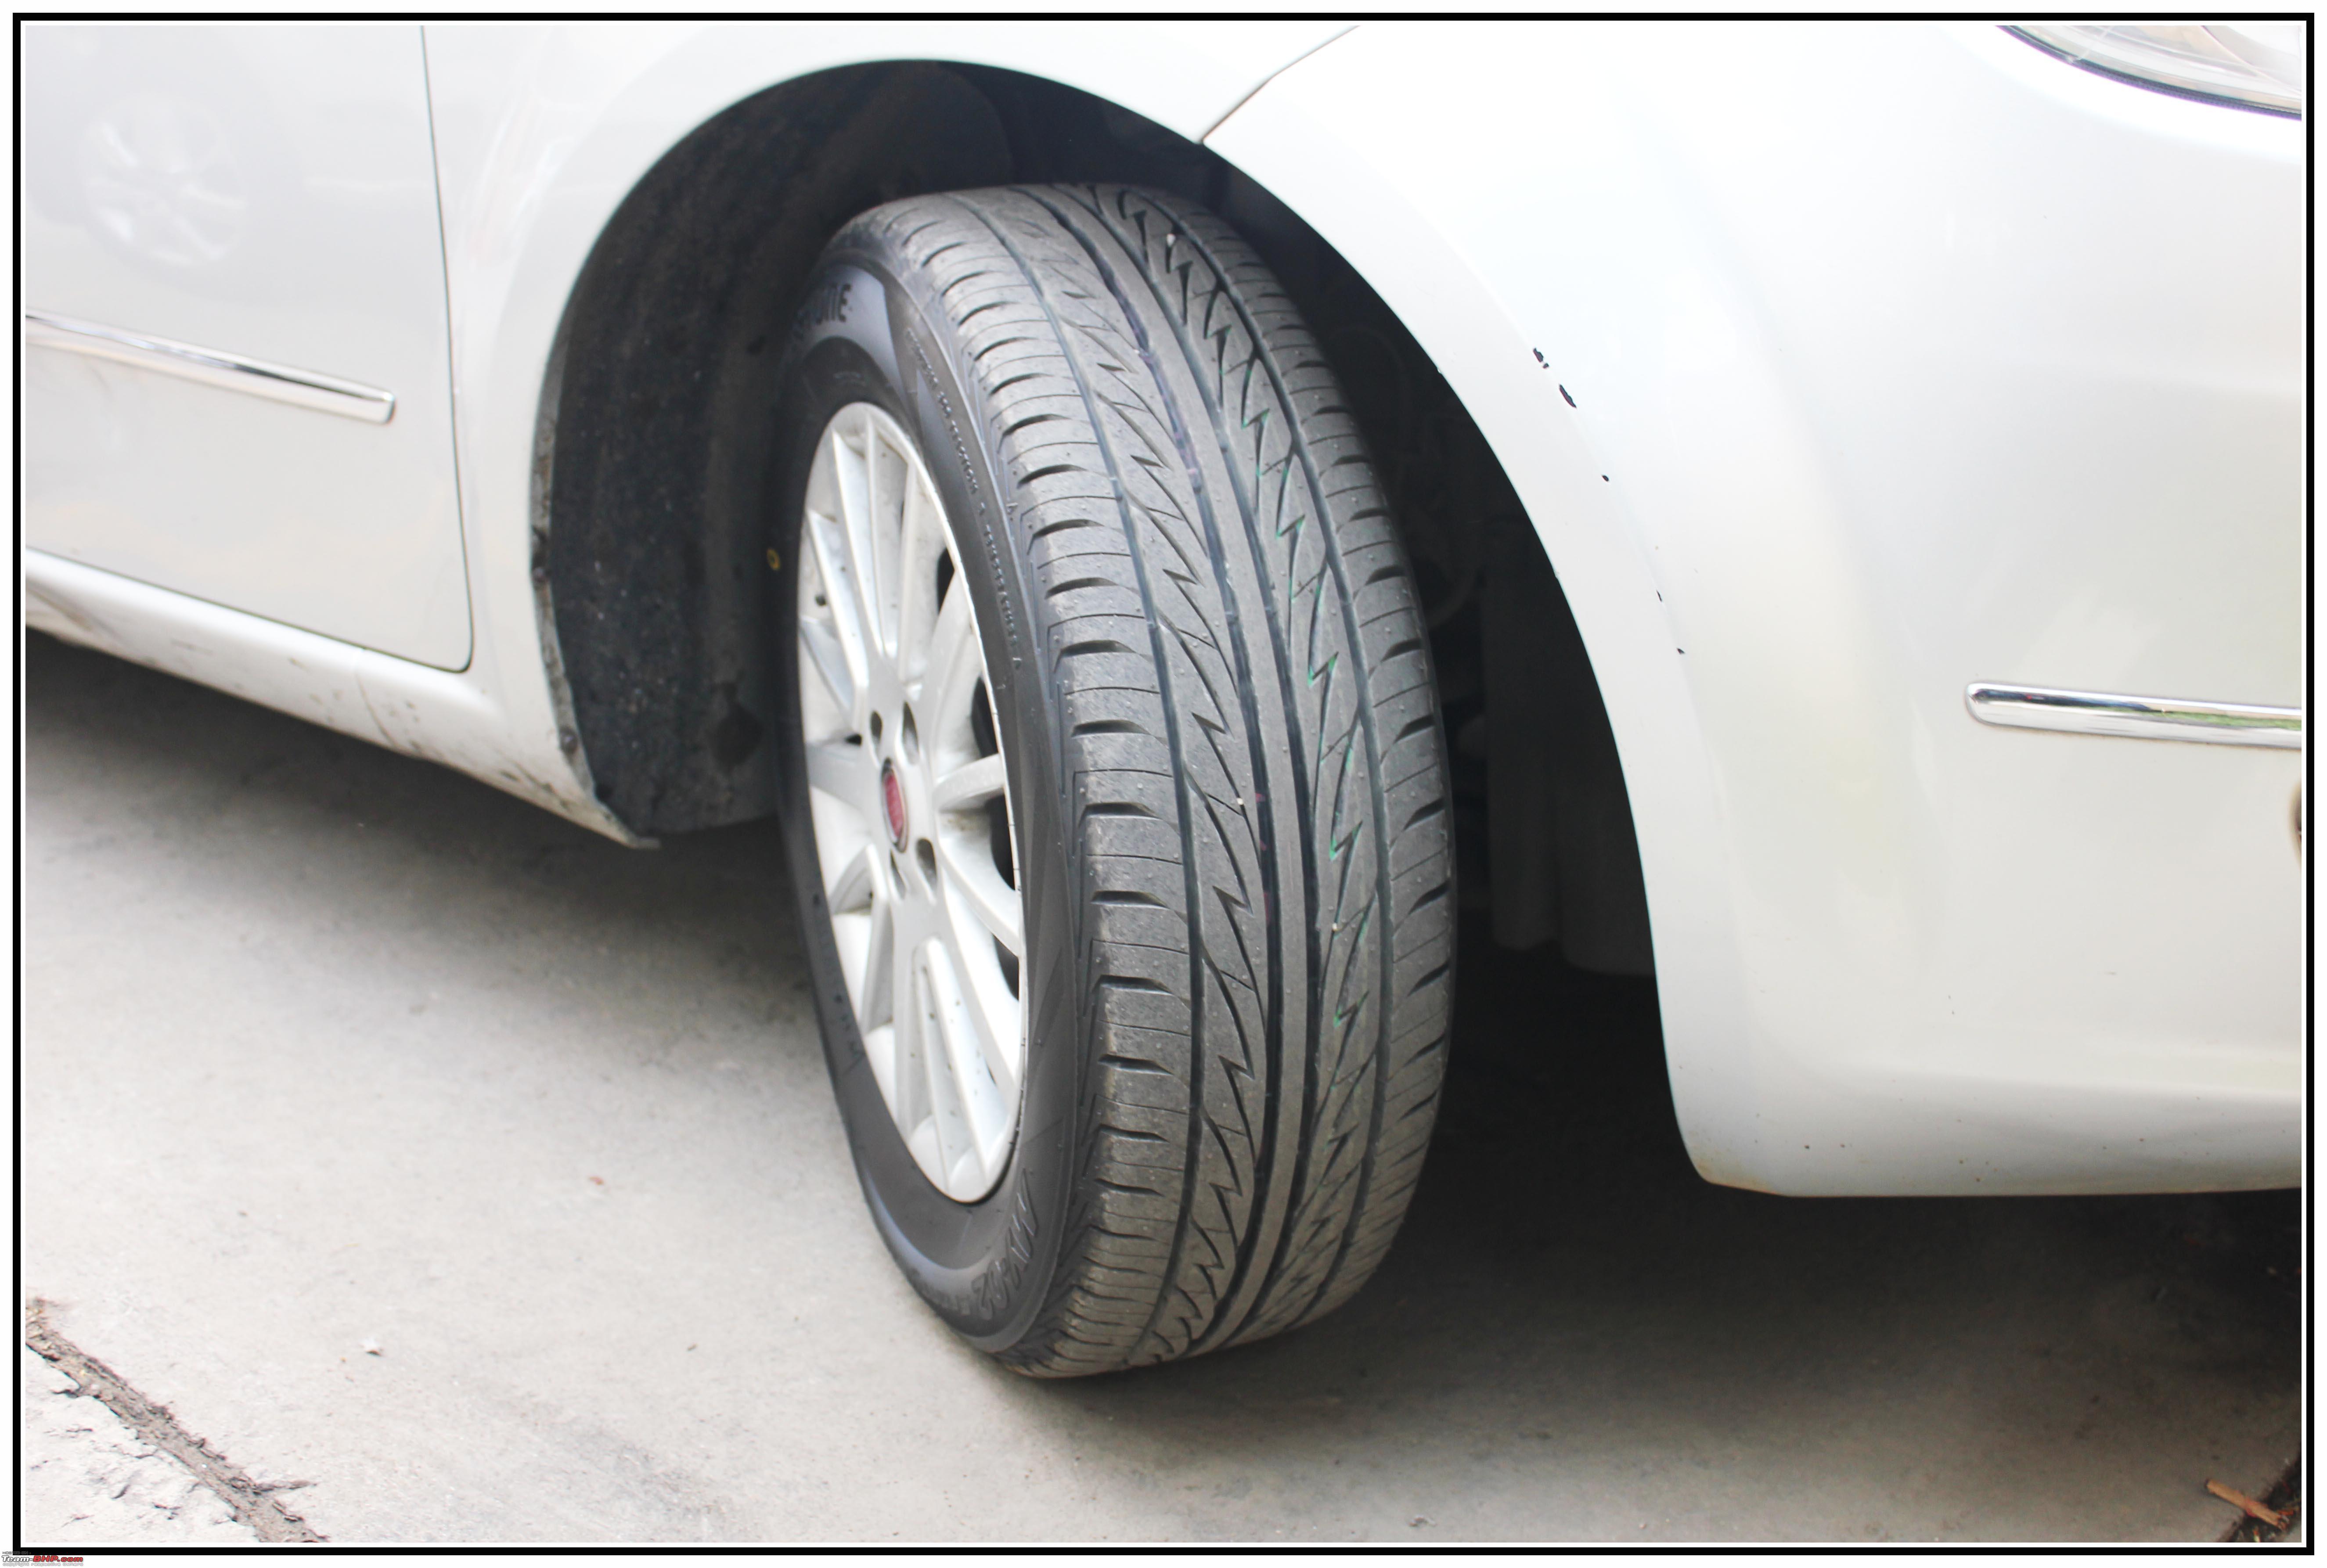 My Cng Linea 14 E 46000 Kms Update Page 18 Team Bhp Ban Mobil Bridgestone Techno Sport 195 50 R16 Vocer Img 2680 Copy